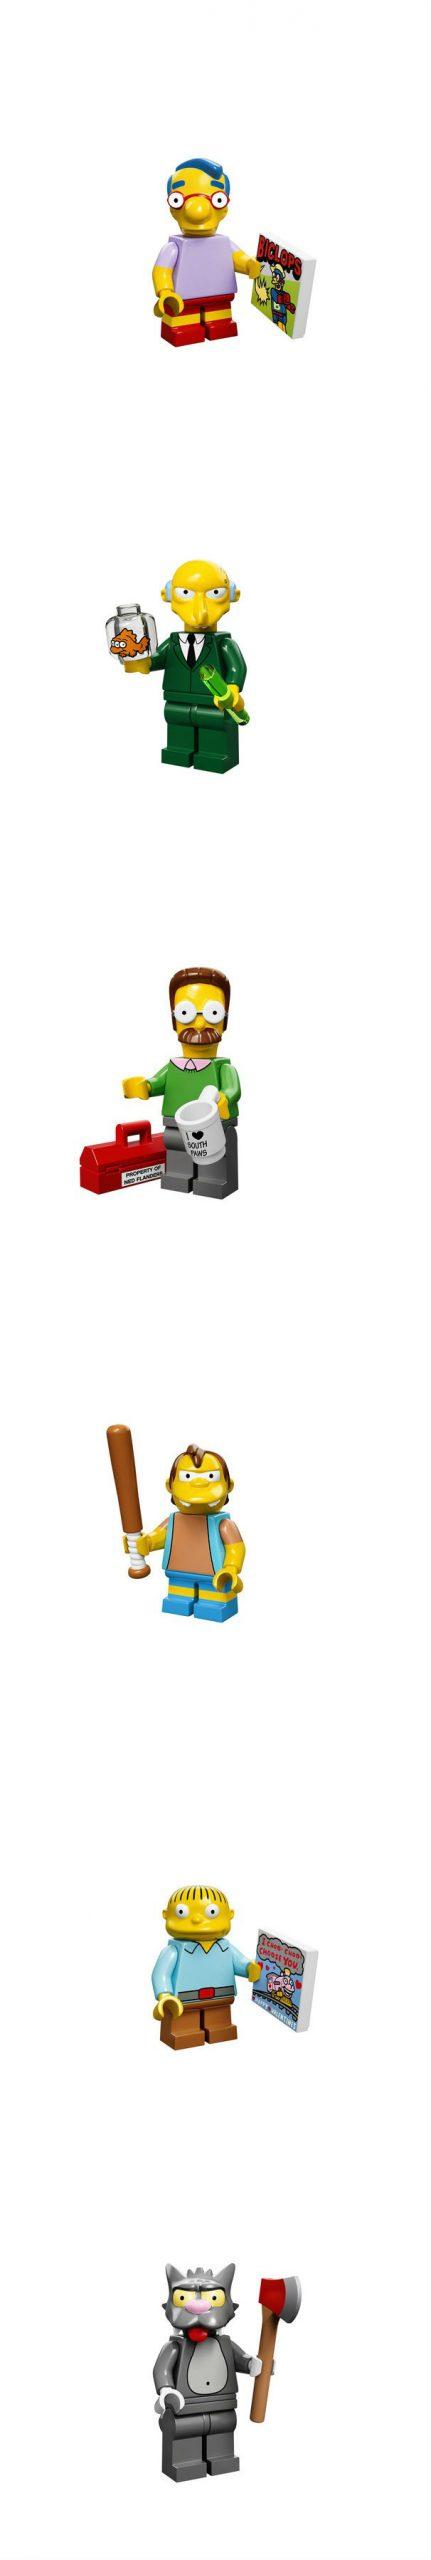 LEGO Simpsons Minifigure Set (2)